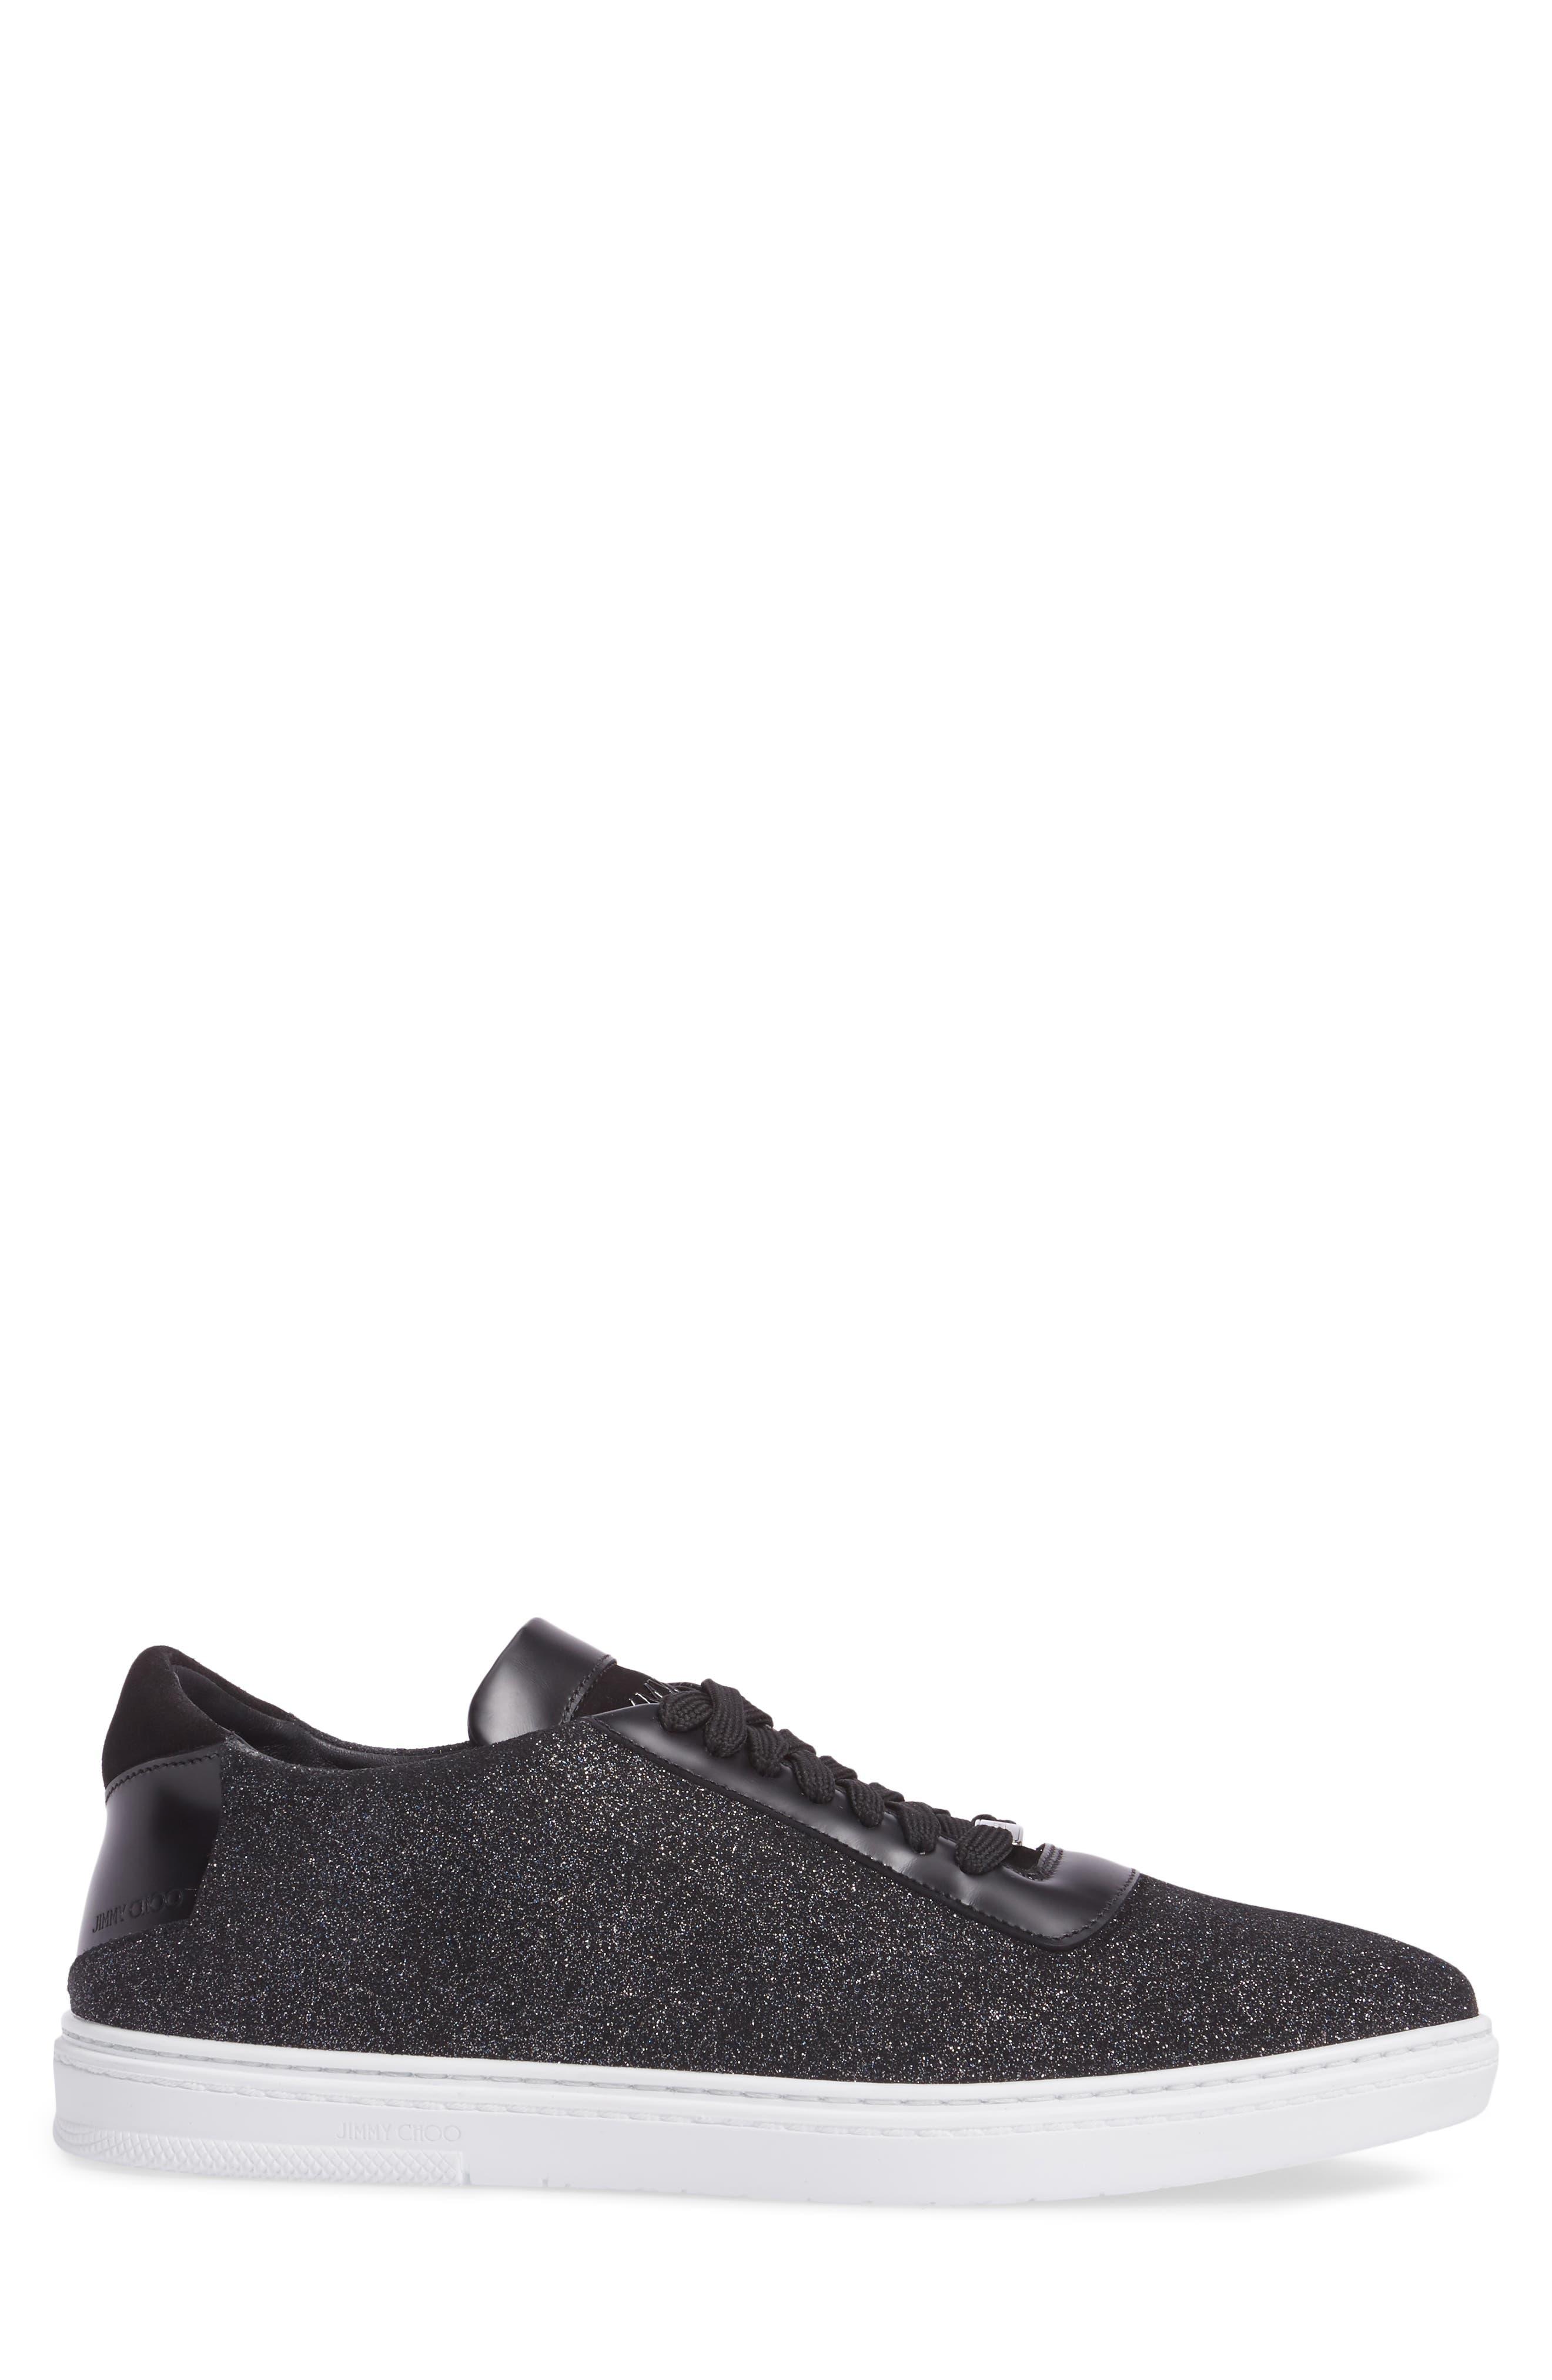 Benn Glitter Low Top Sneaker,                             Alternate thumbnail 3, color,                             Smoky Blue